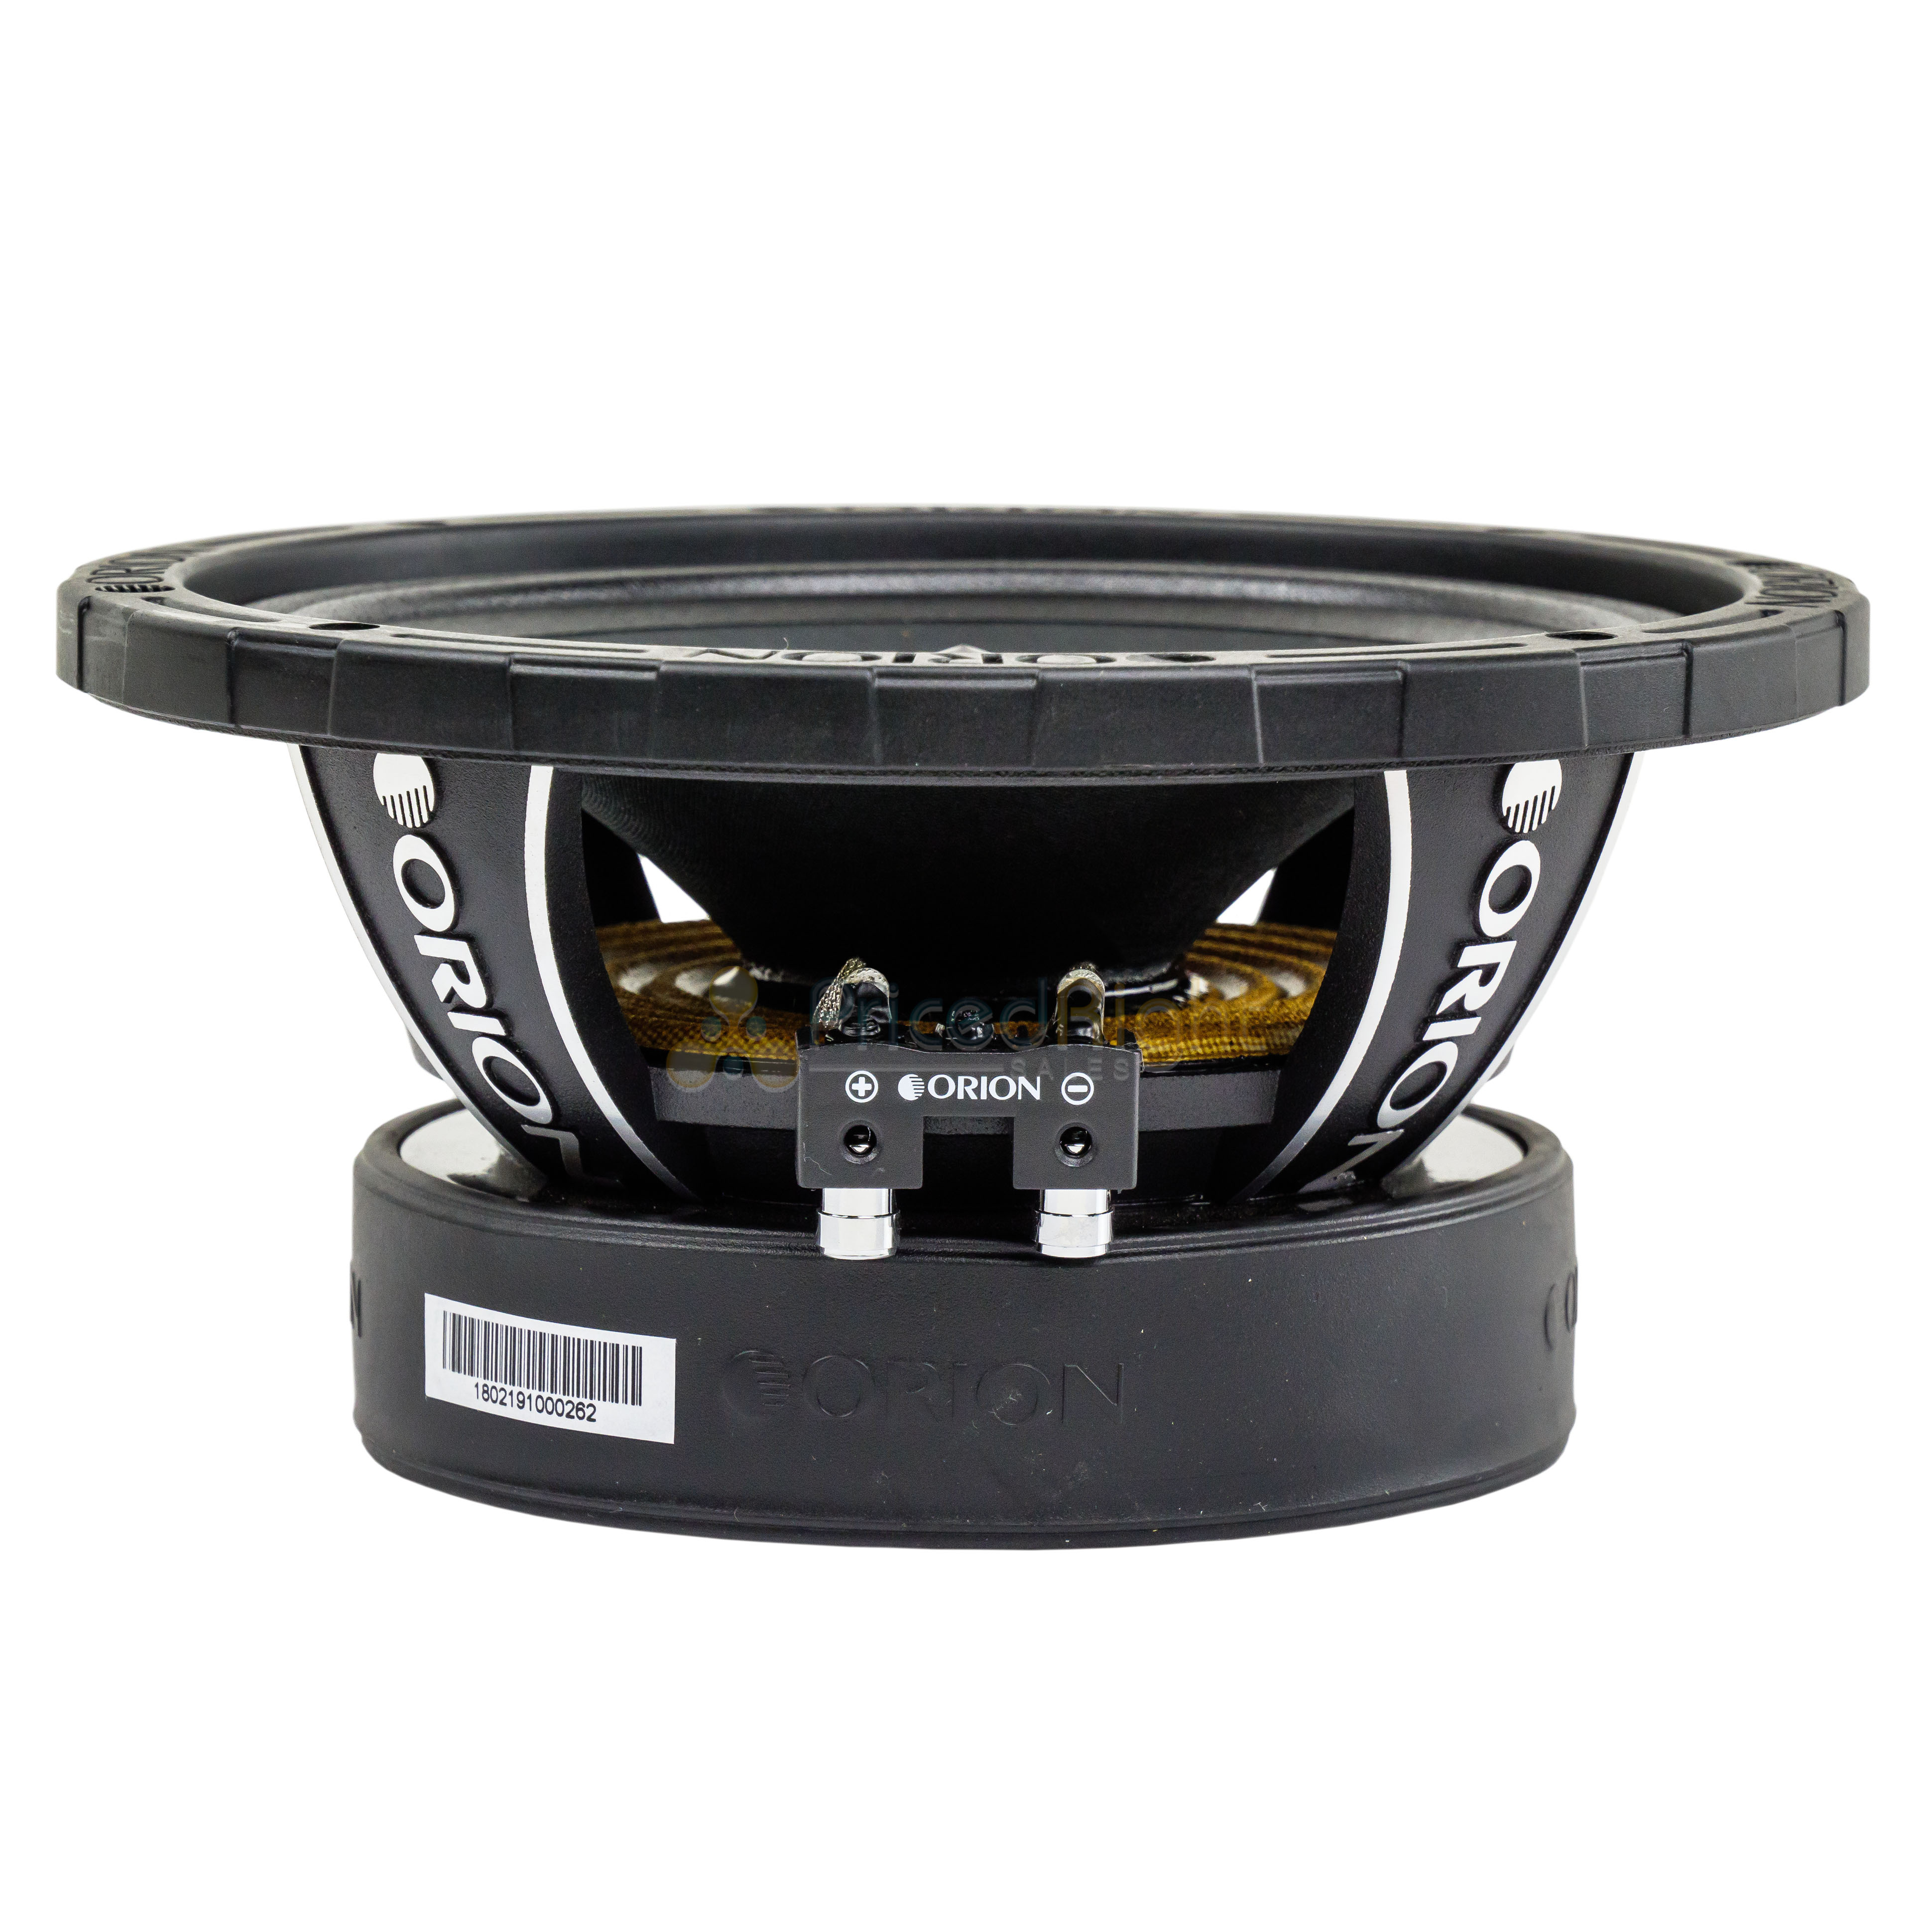 2 Orion Audio 1600 W Watt 8 U0026quot  Mid Range Bass Loud 8 Ohm Speakers Pair Xtx858 685650077147